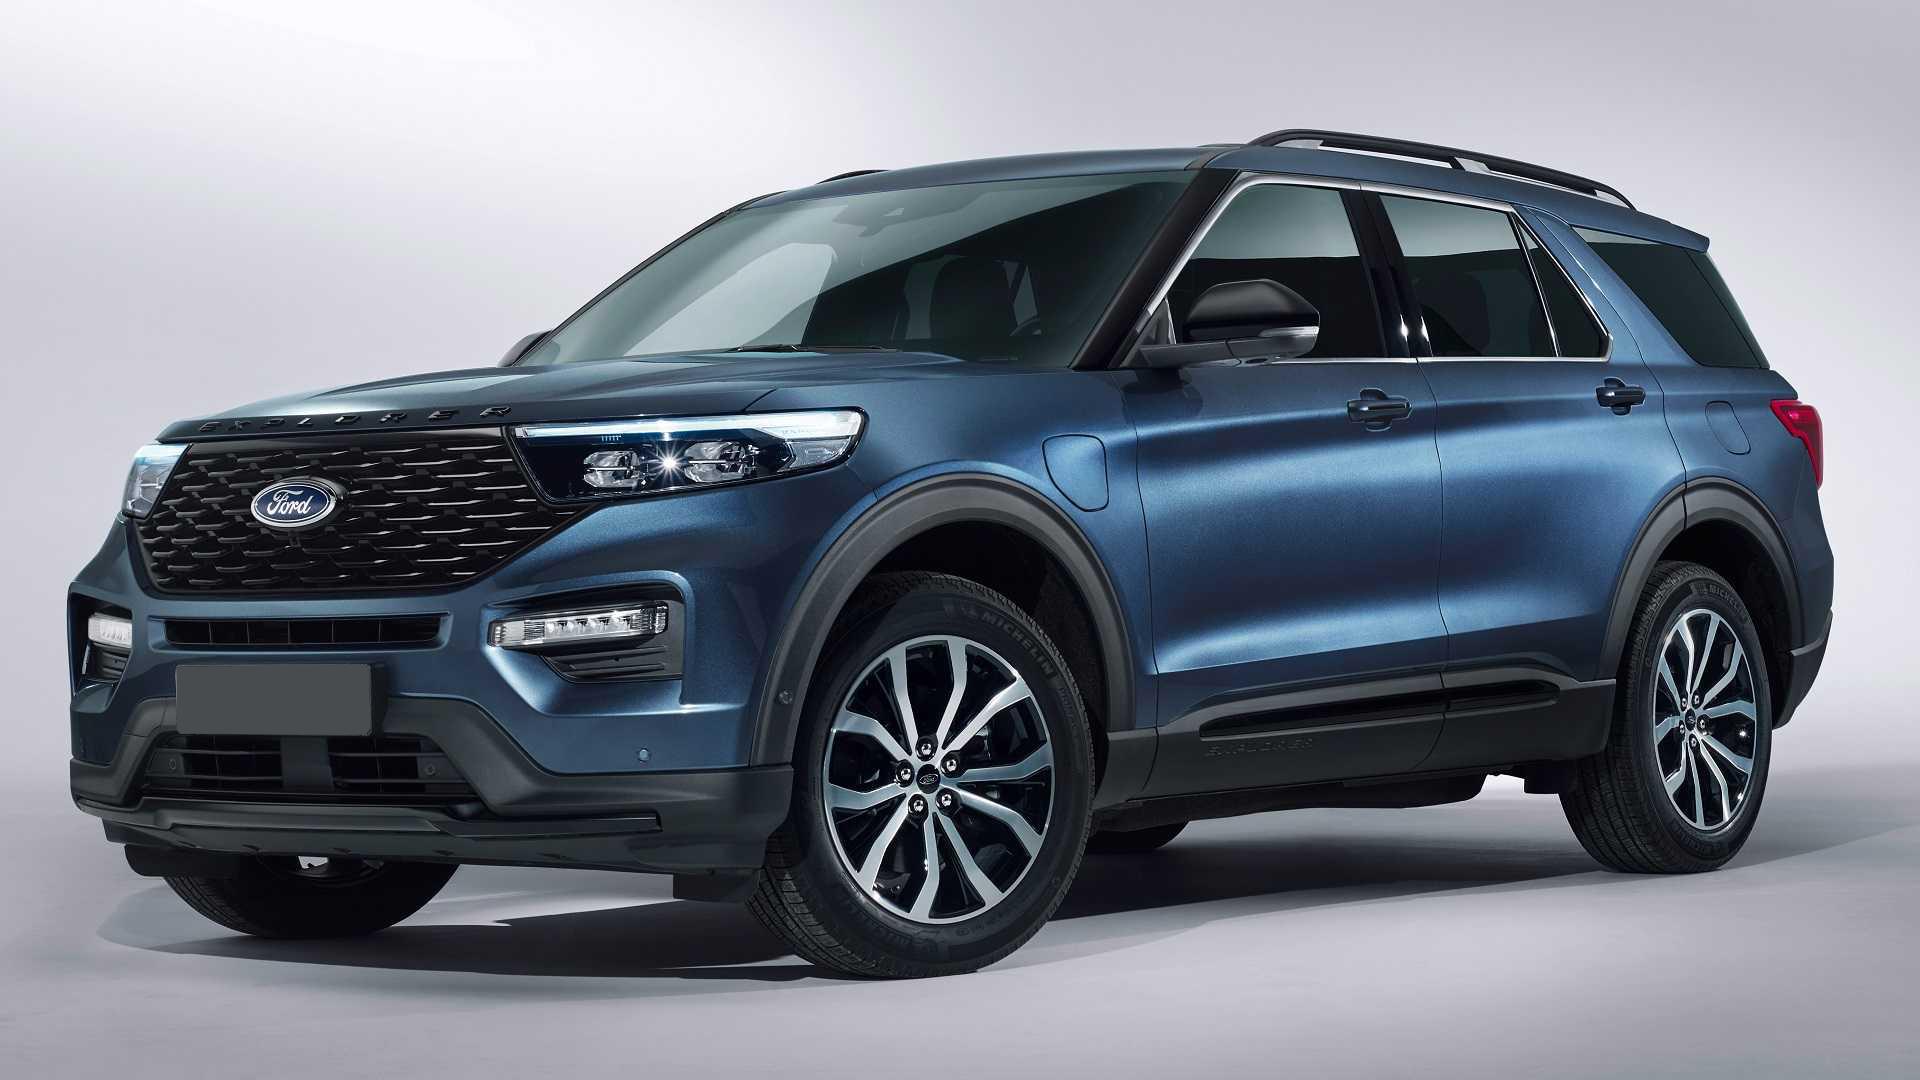 4 Ford Explorer Platinum Xlt Sport Release Date - spirotours.com